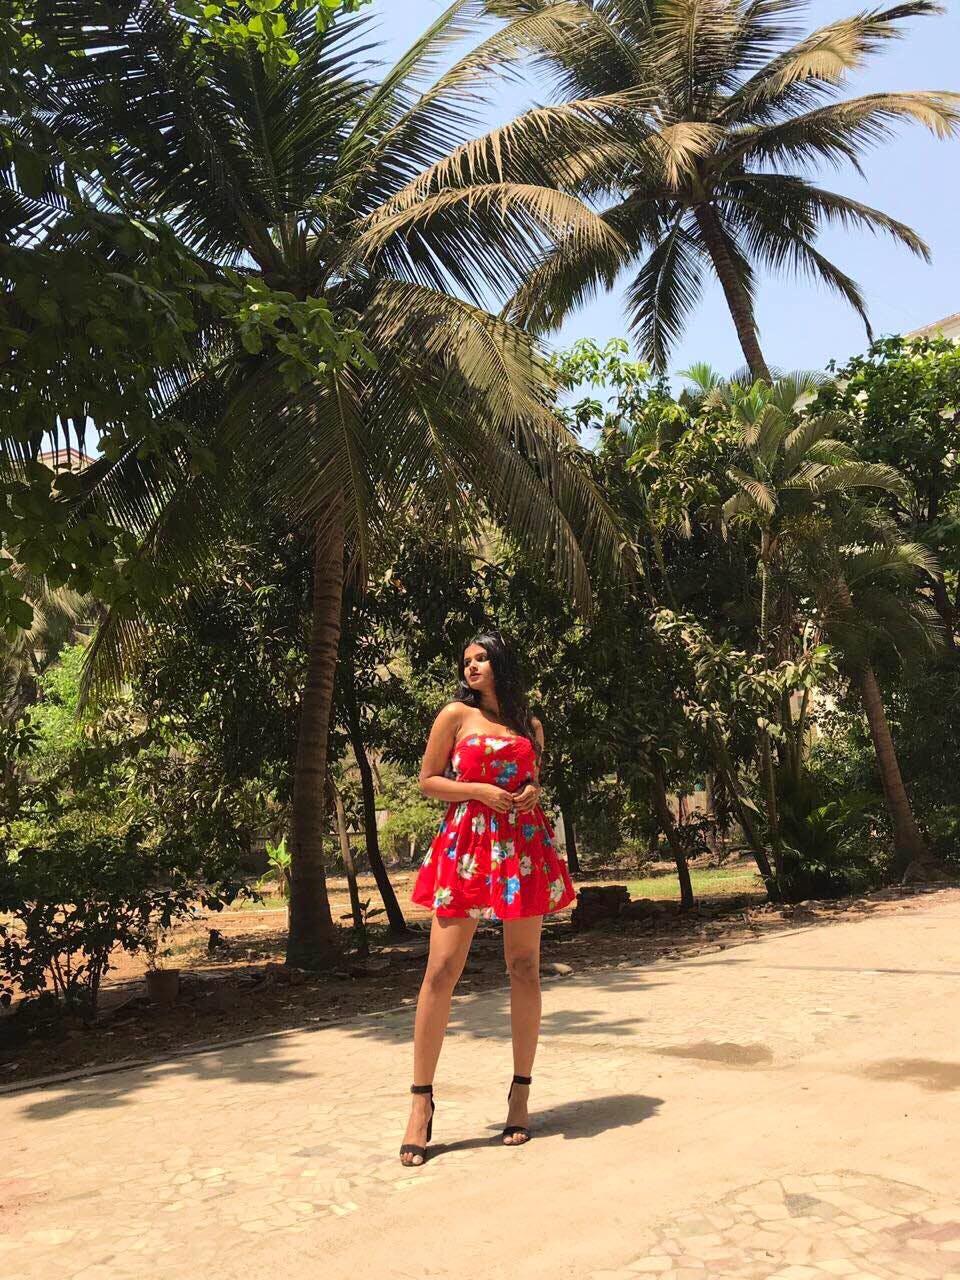 Tree,Clothing,Palm tree,Vacation,Arecales,Plant,Botany,Summer,Woody plant,Fashion